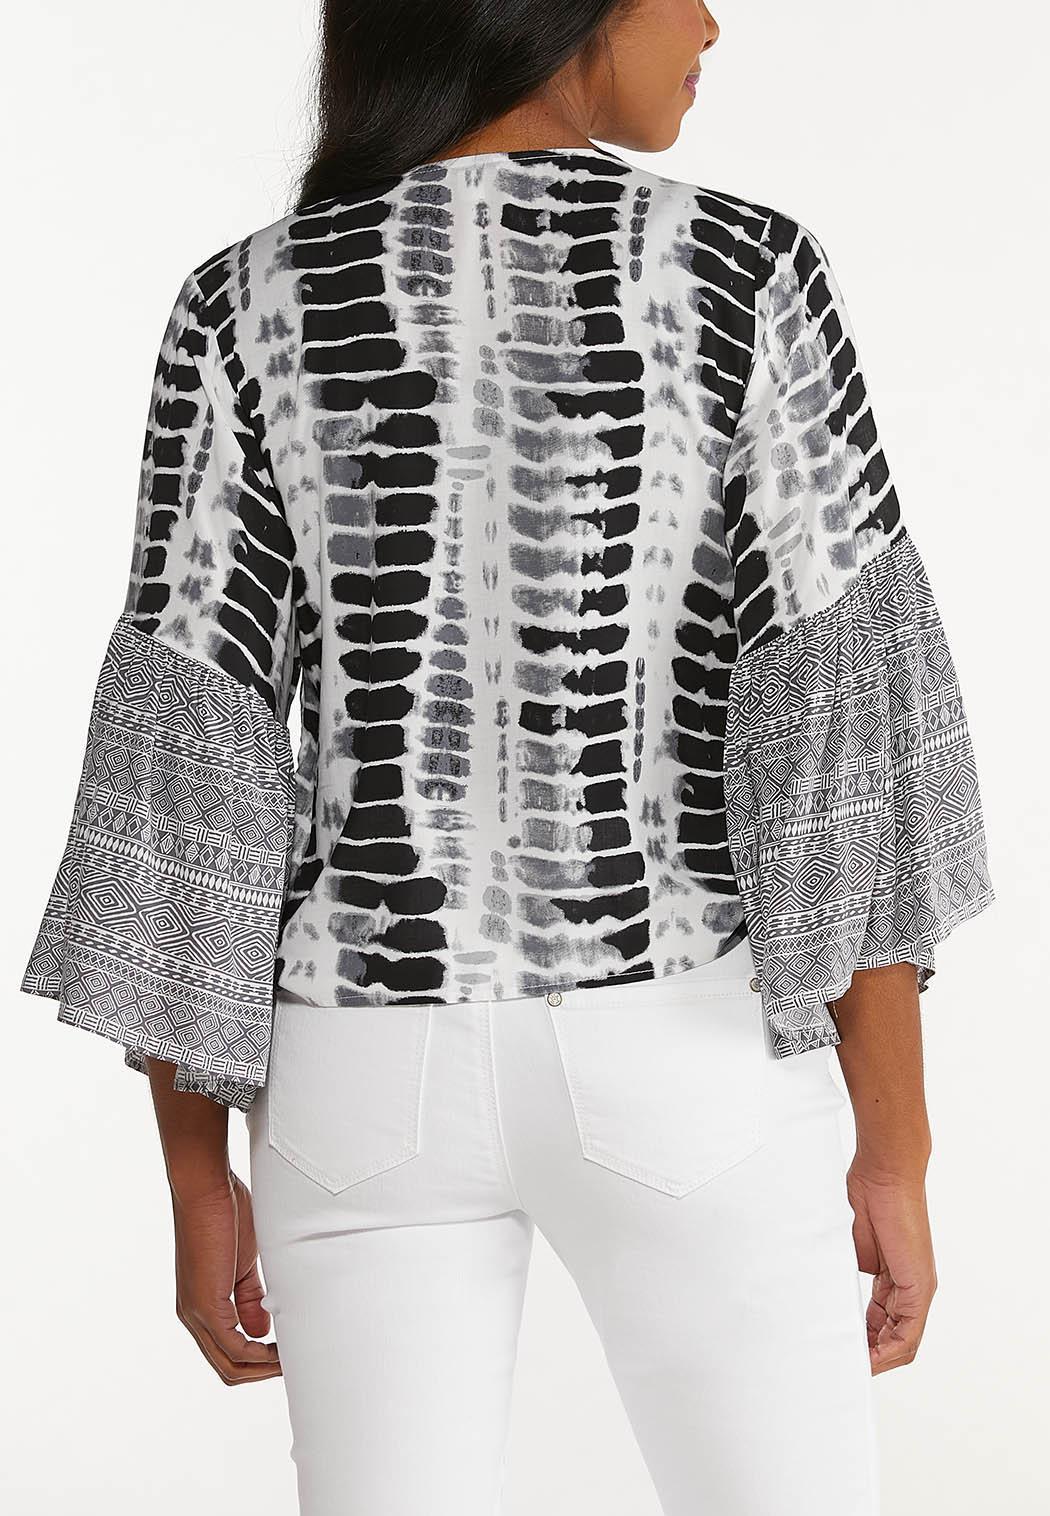 Plus Size Mixed Print Tie Front Top (Item #44547340)